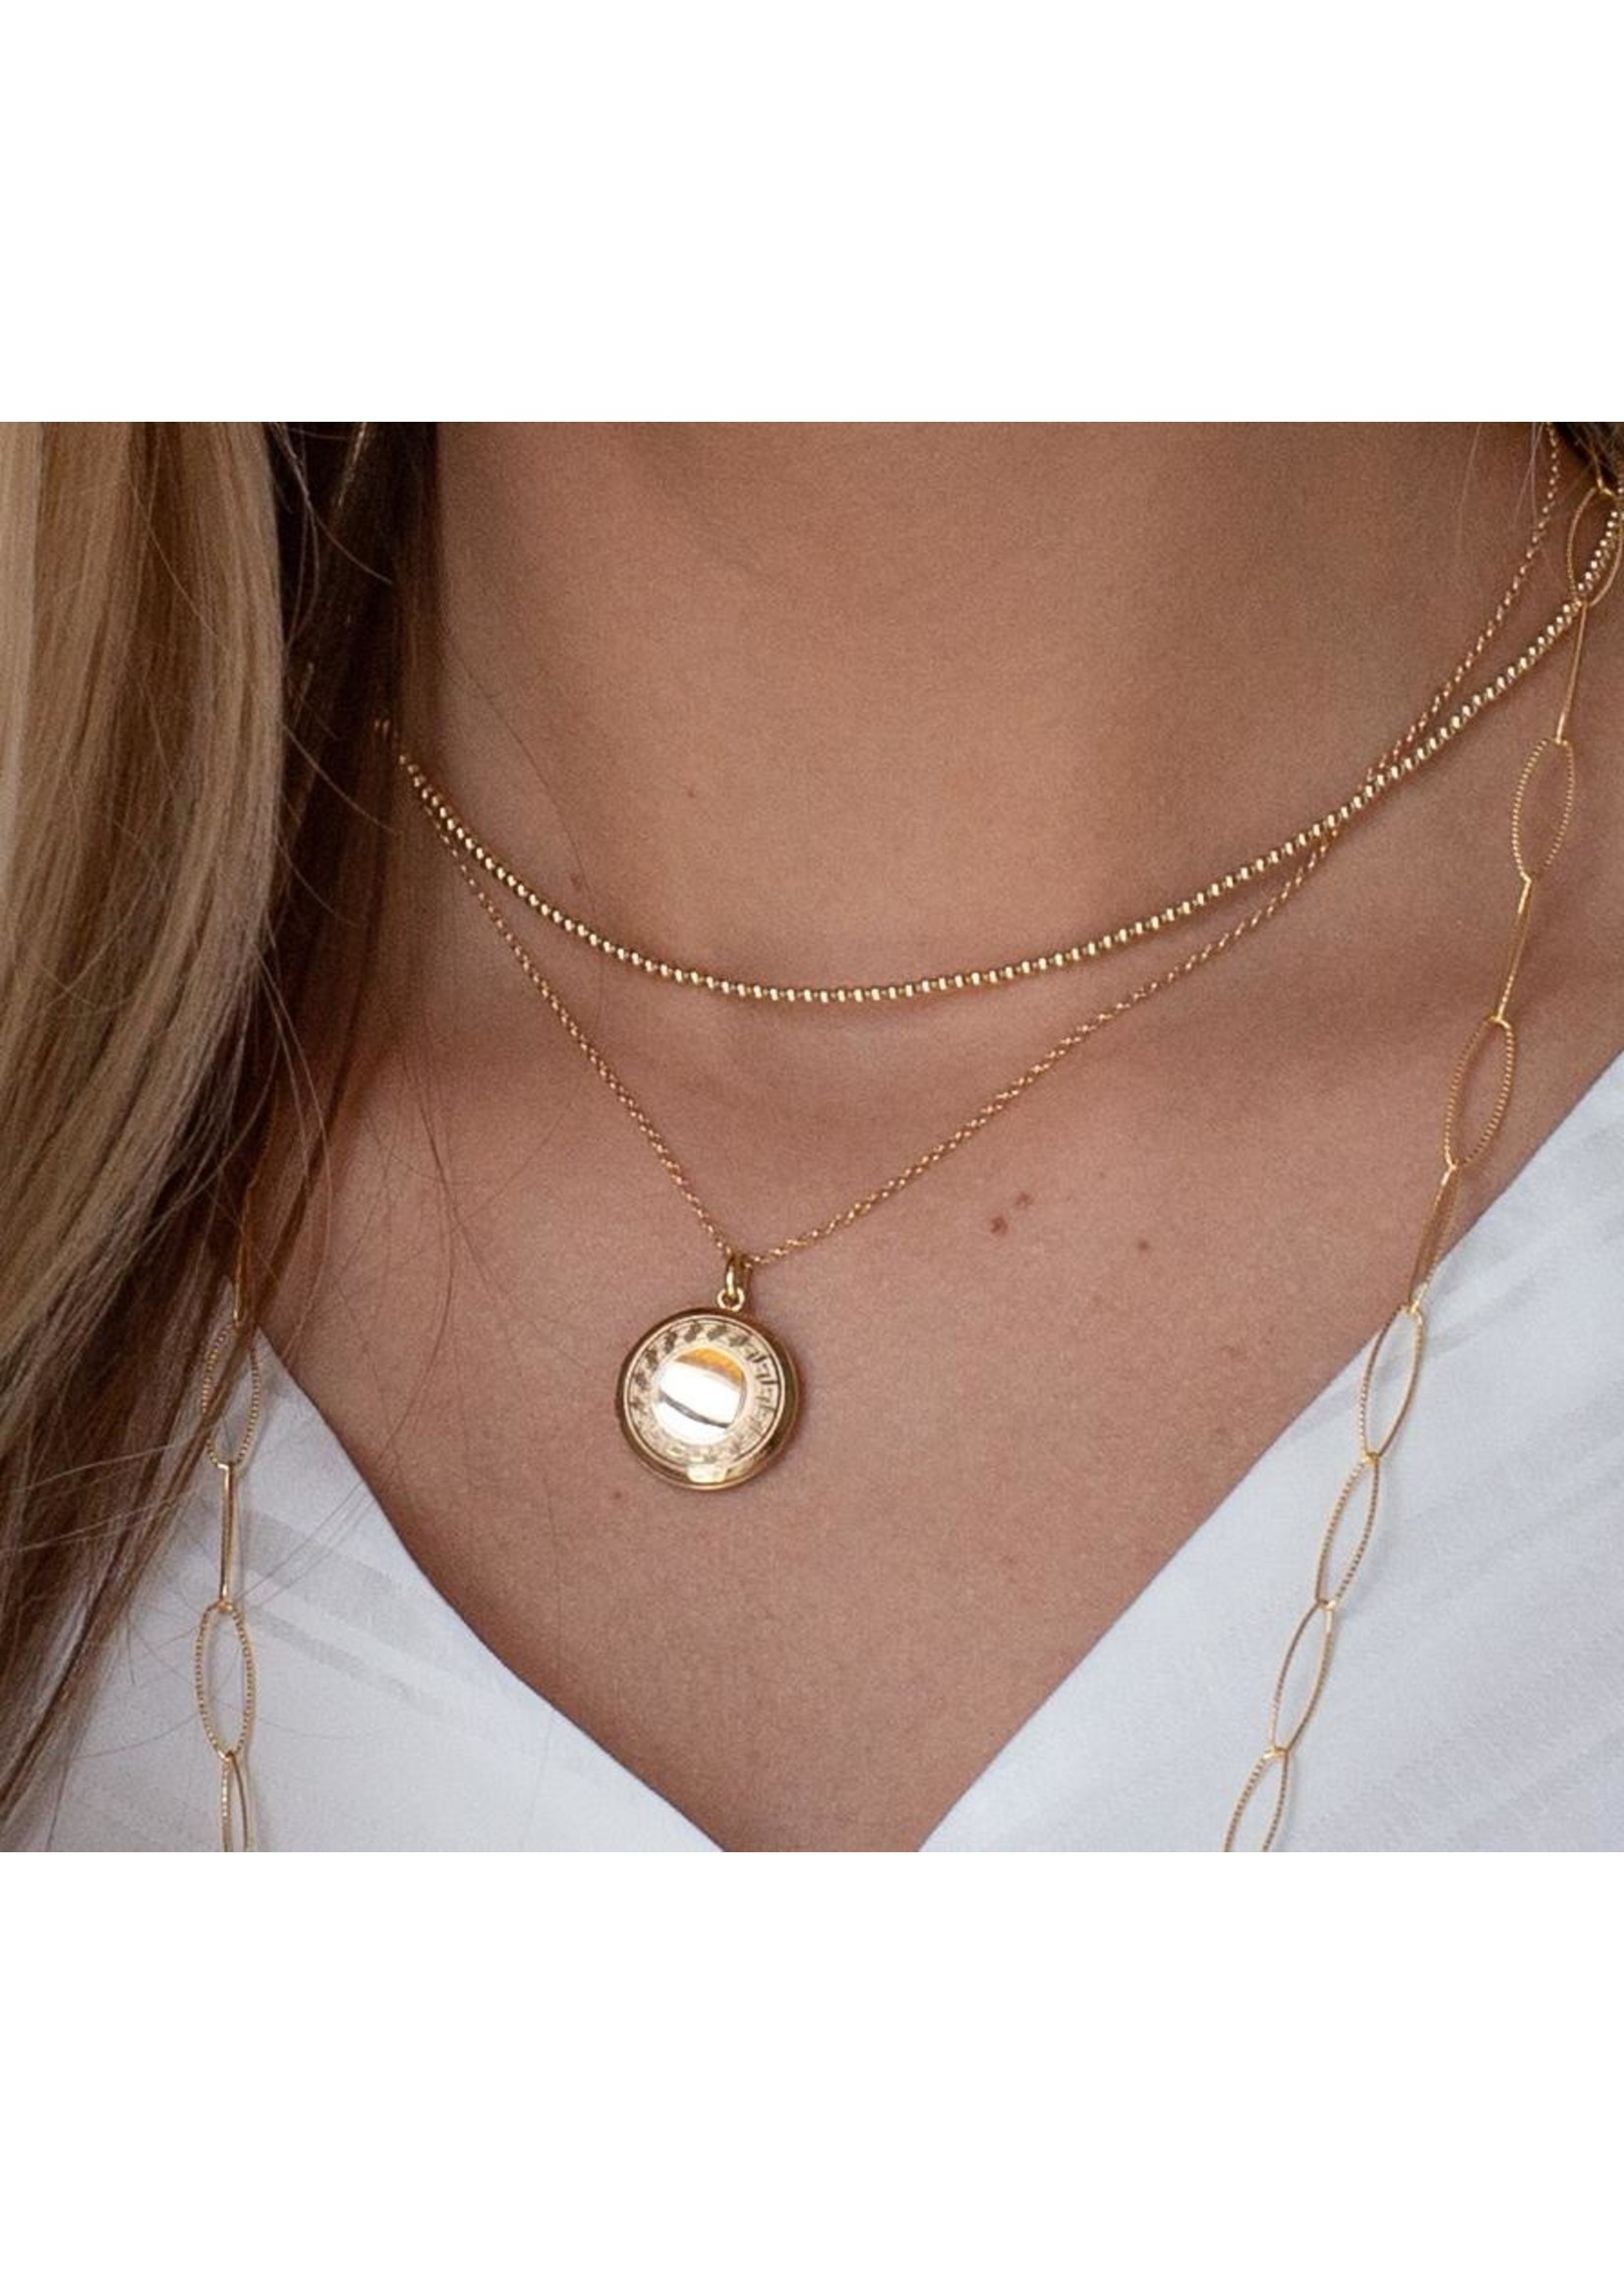 "enewton 16"" Necklace Gold - Cherish Small Gold Locket"